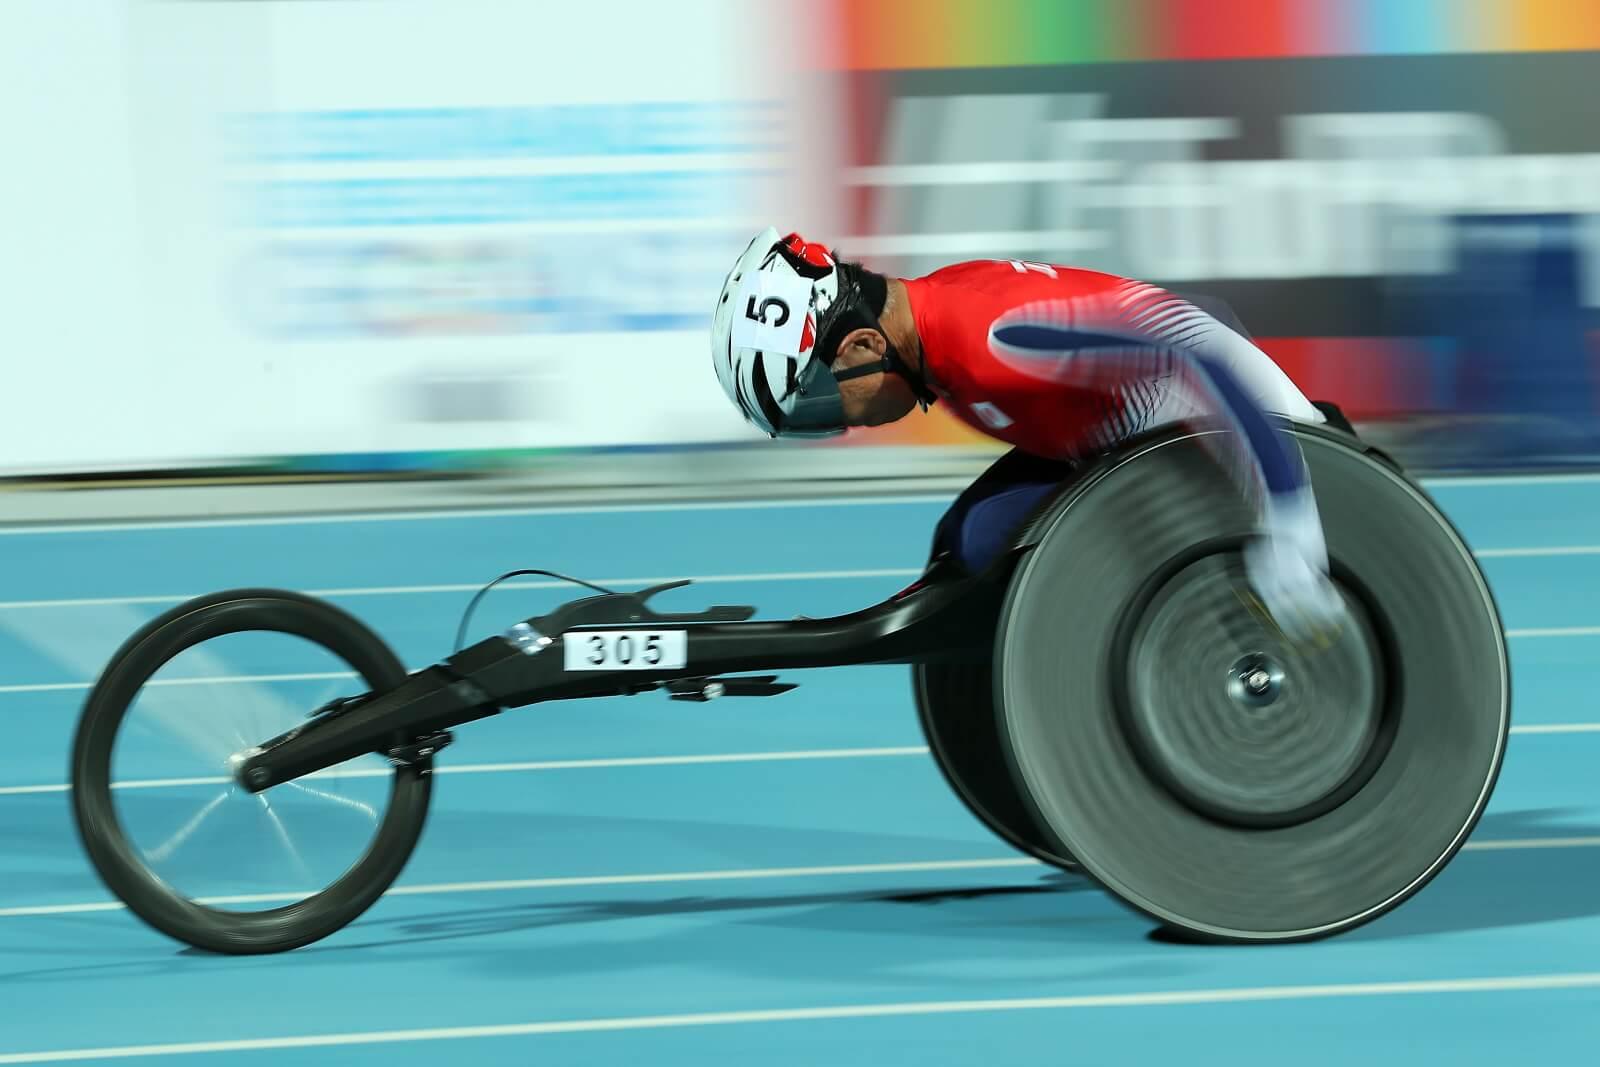 Mistrzostwa świata w para lekkoatletyce fot. EPA/MAHMOUD KHALED